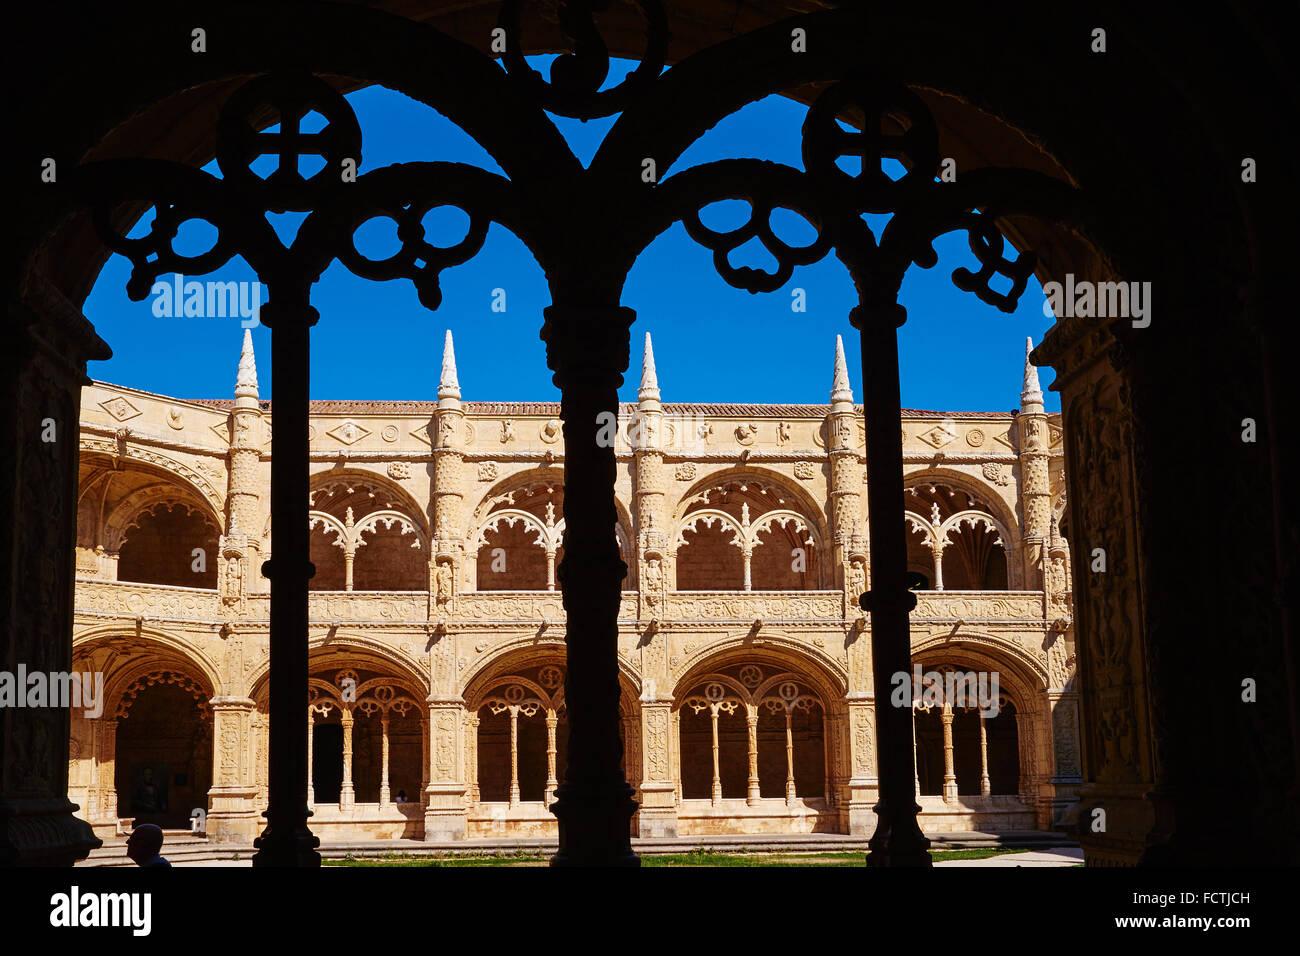 Portugal, Lisbon, mosteiro dos Jeronimos, Jeronimos monastery, UNESCO world heritage, the cloister - Stock Image